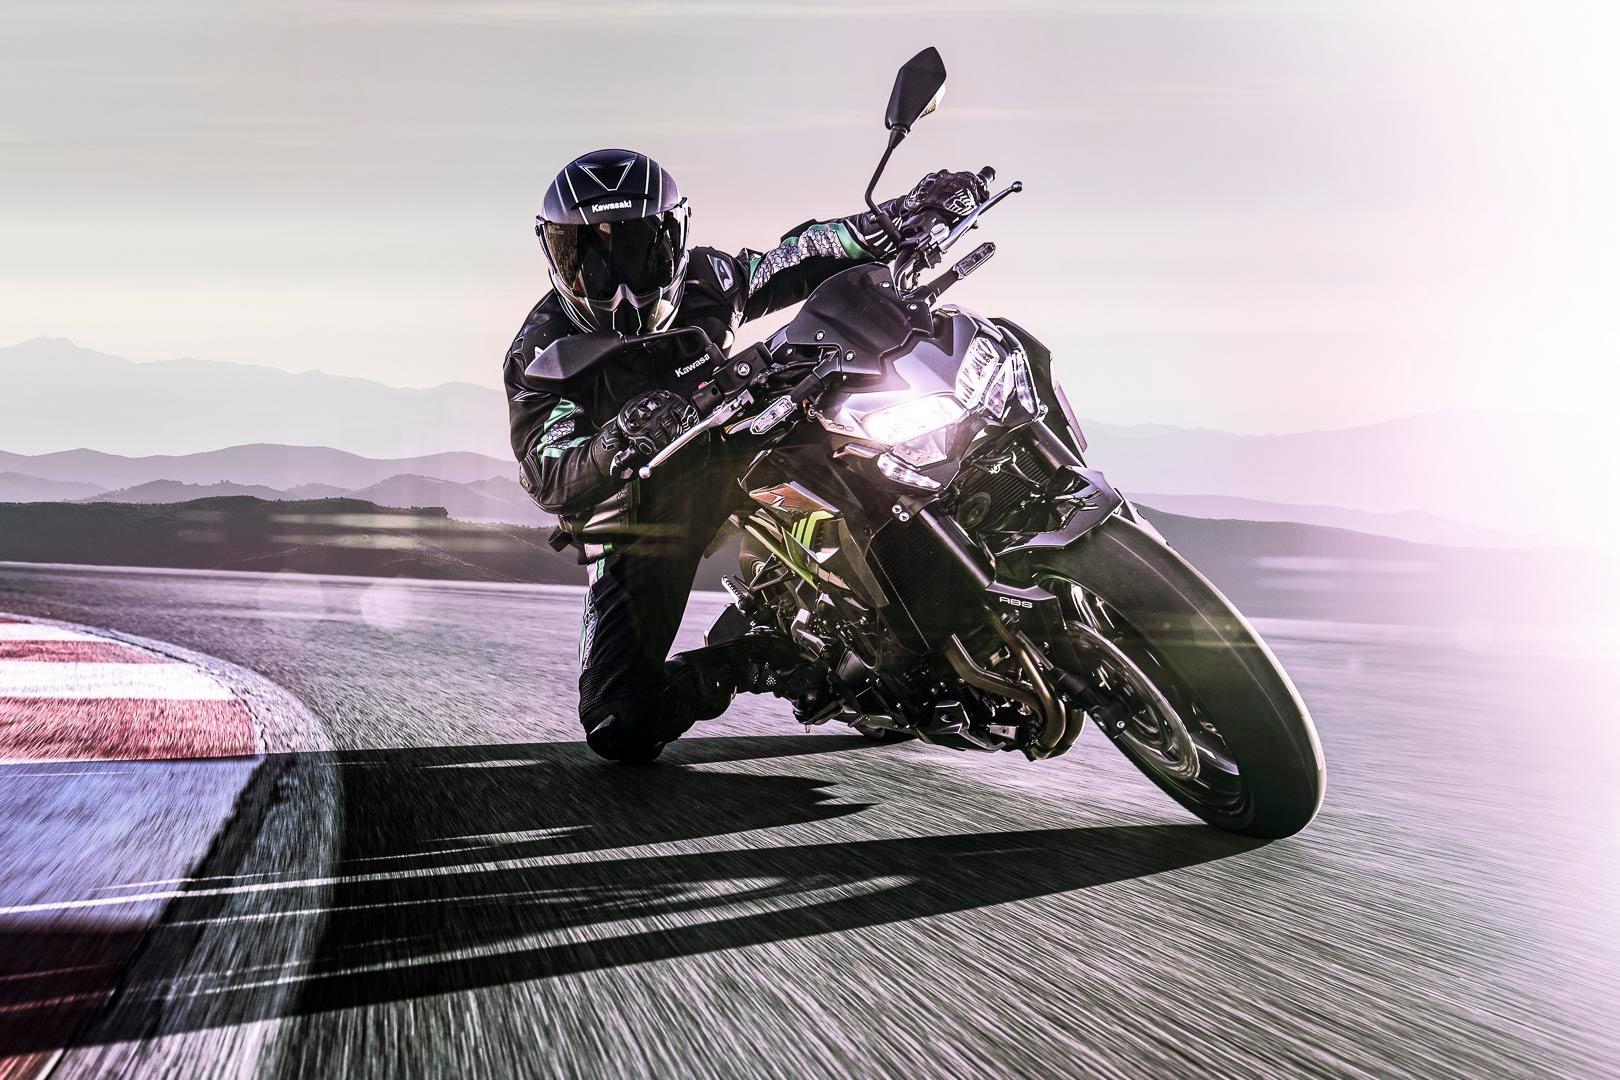 2020 Z900 top speed